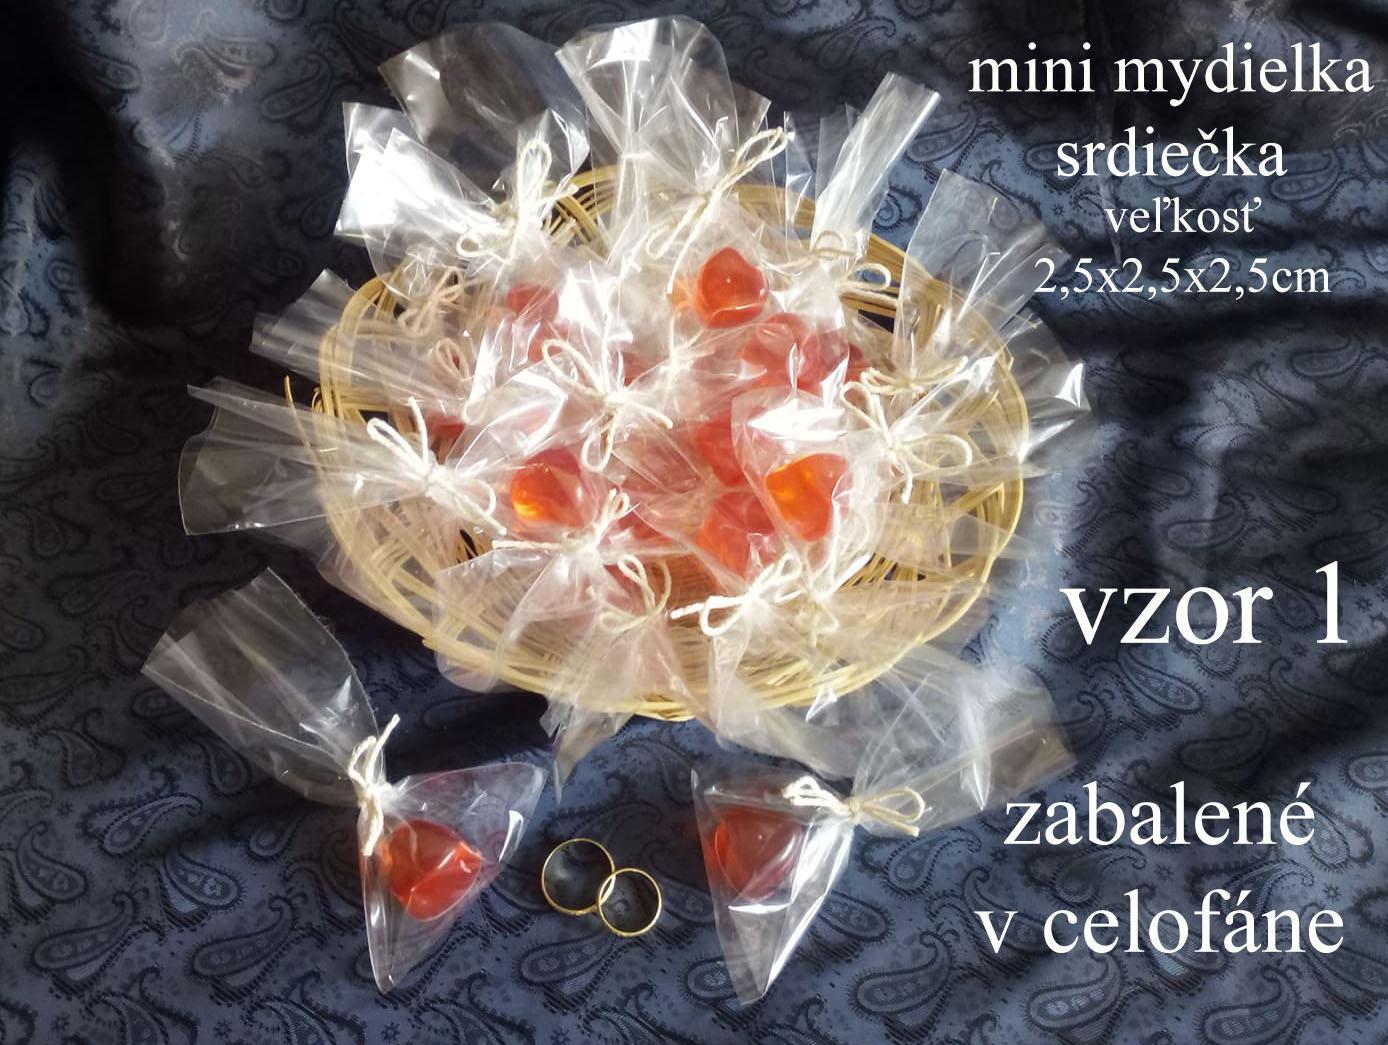 Svadobne mini  mydielka - glycerinove - Obrázok č. 3